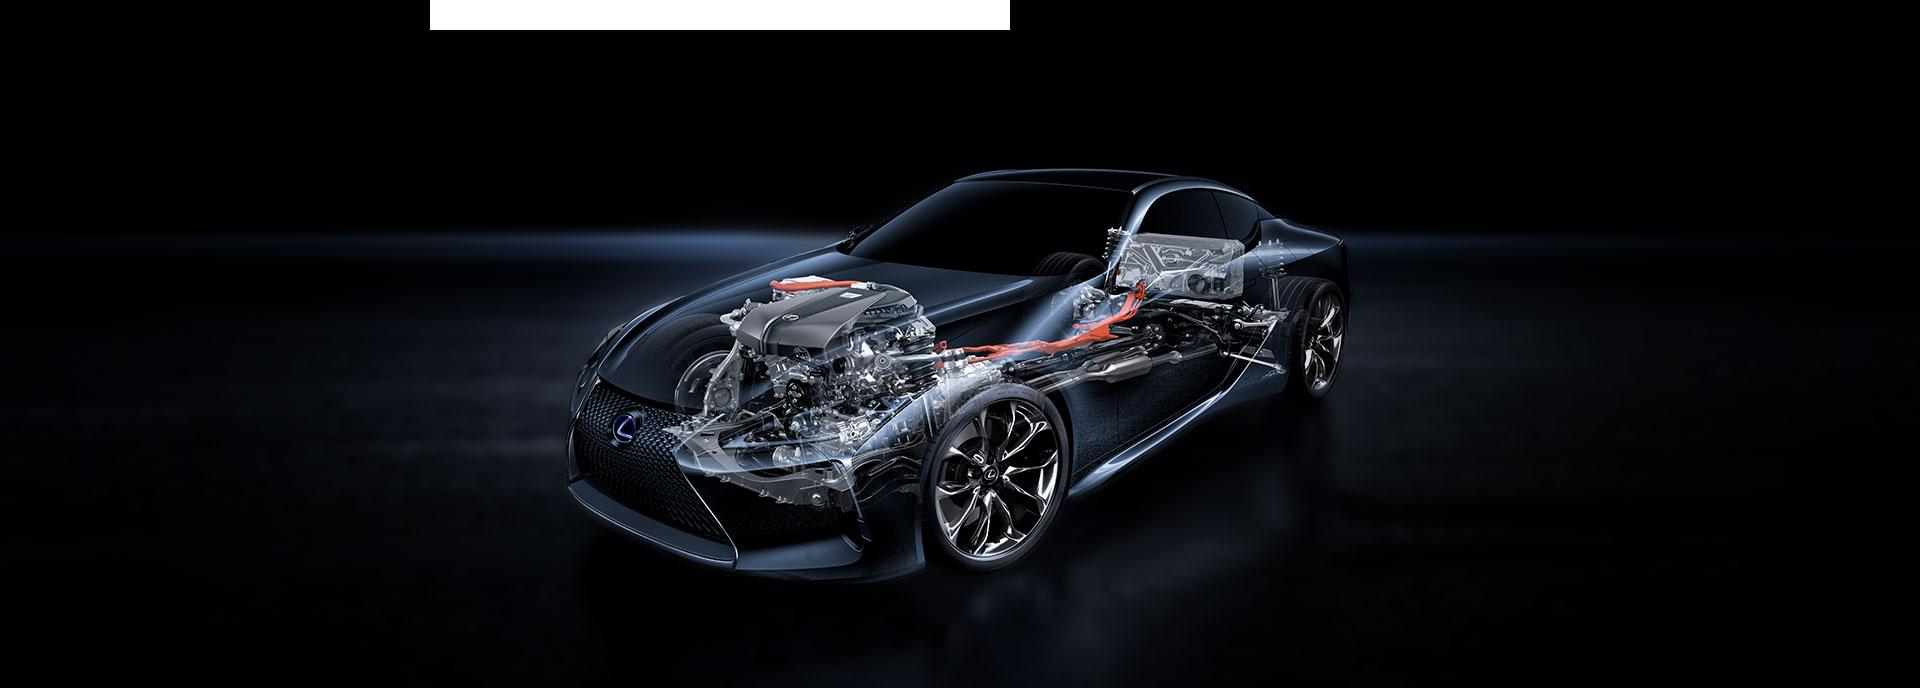 2017 Lexus LC Innovative Materials 500h